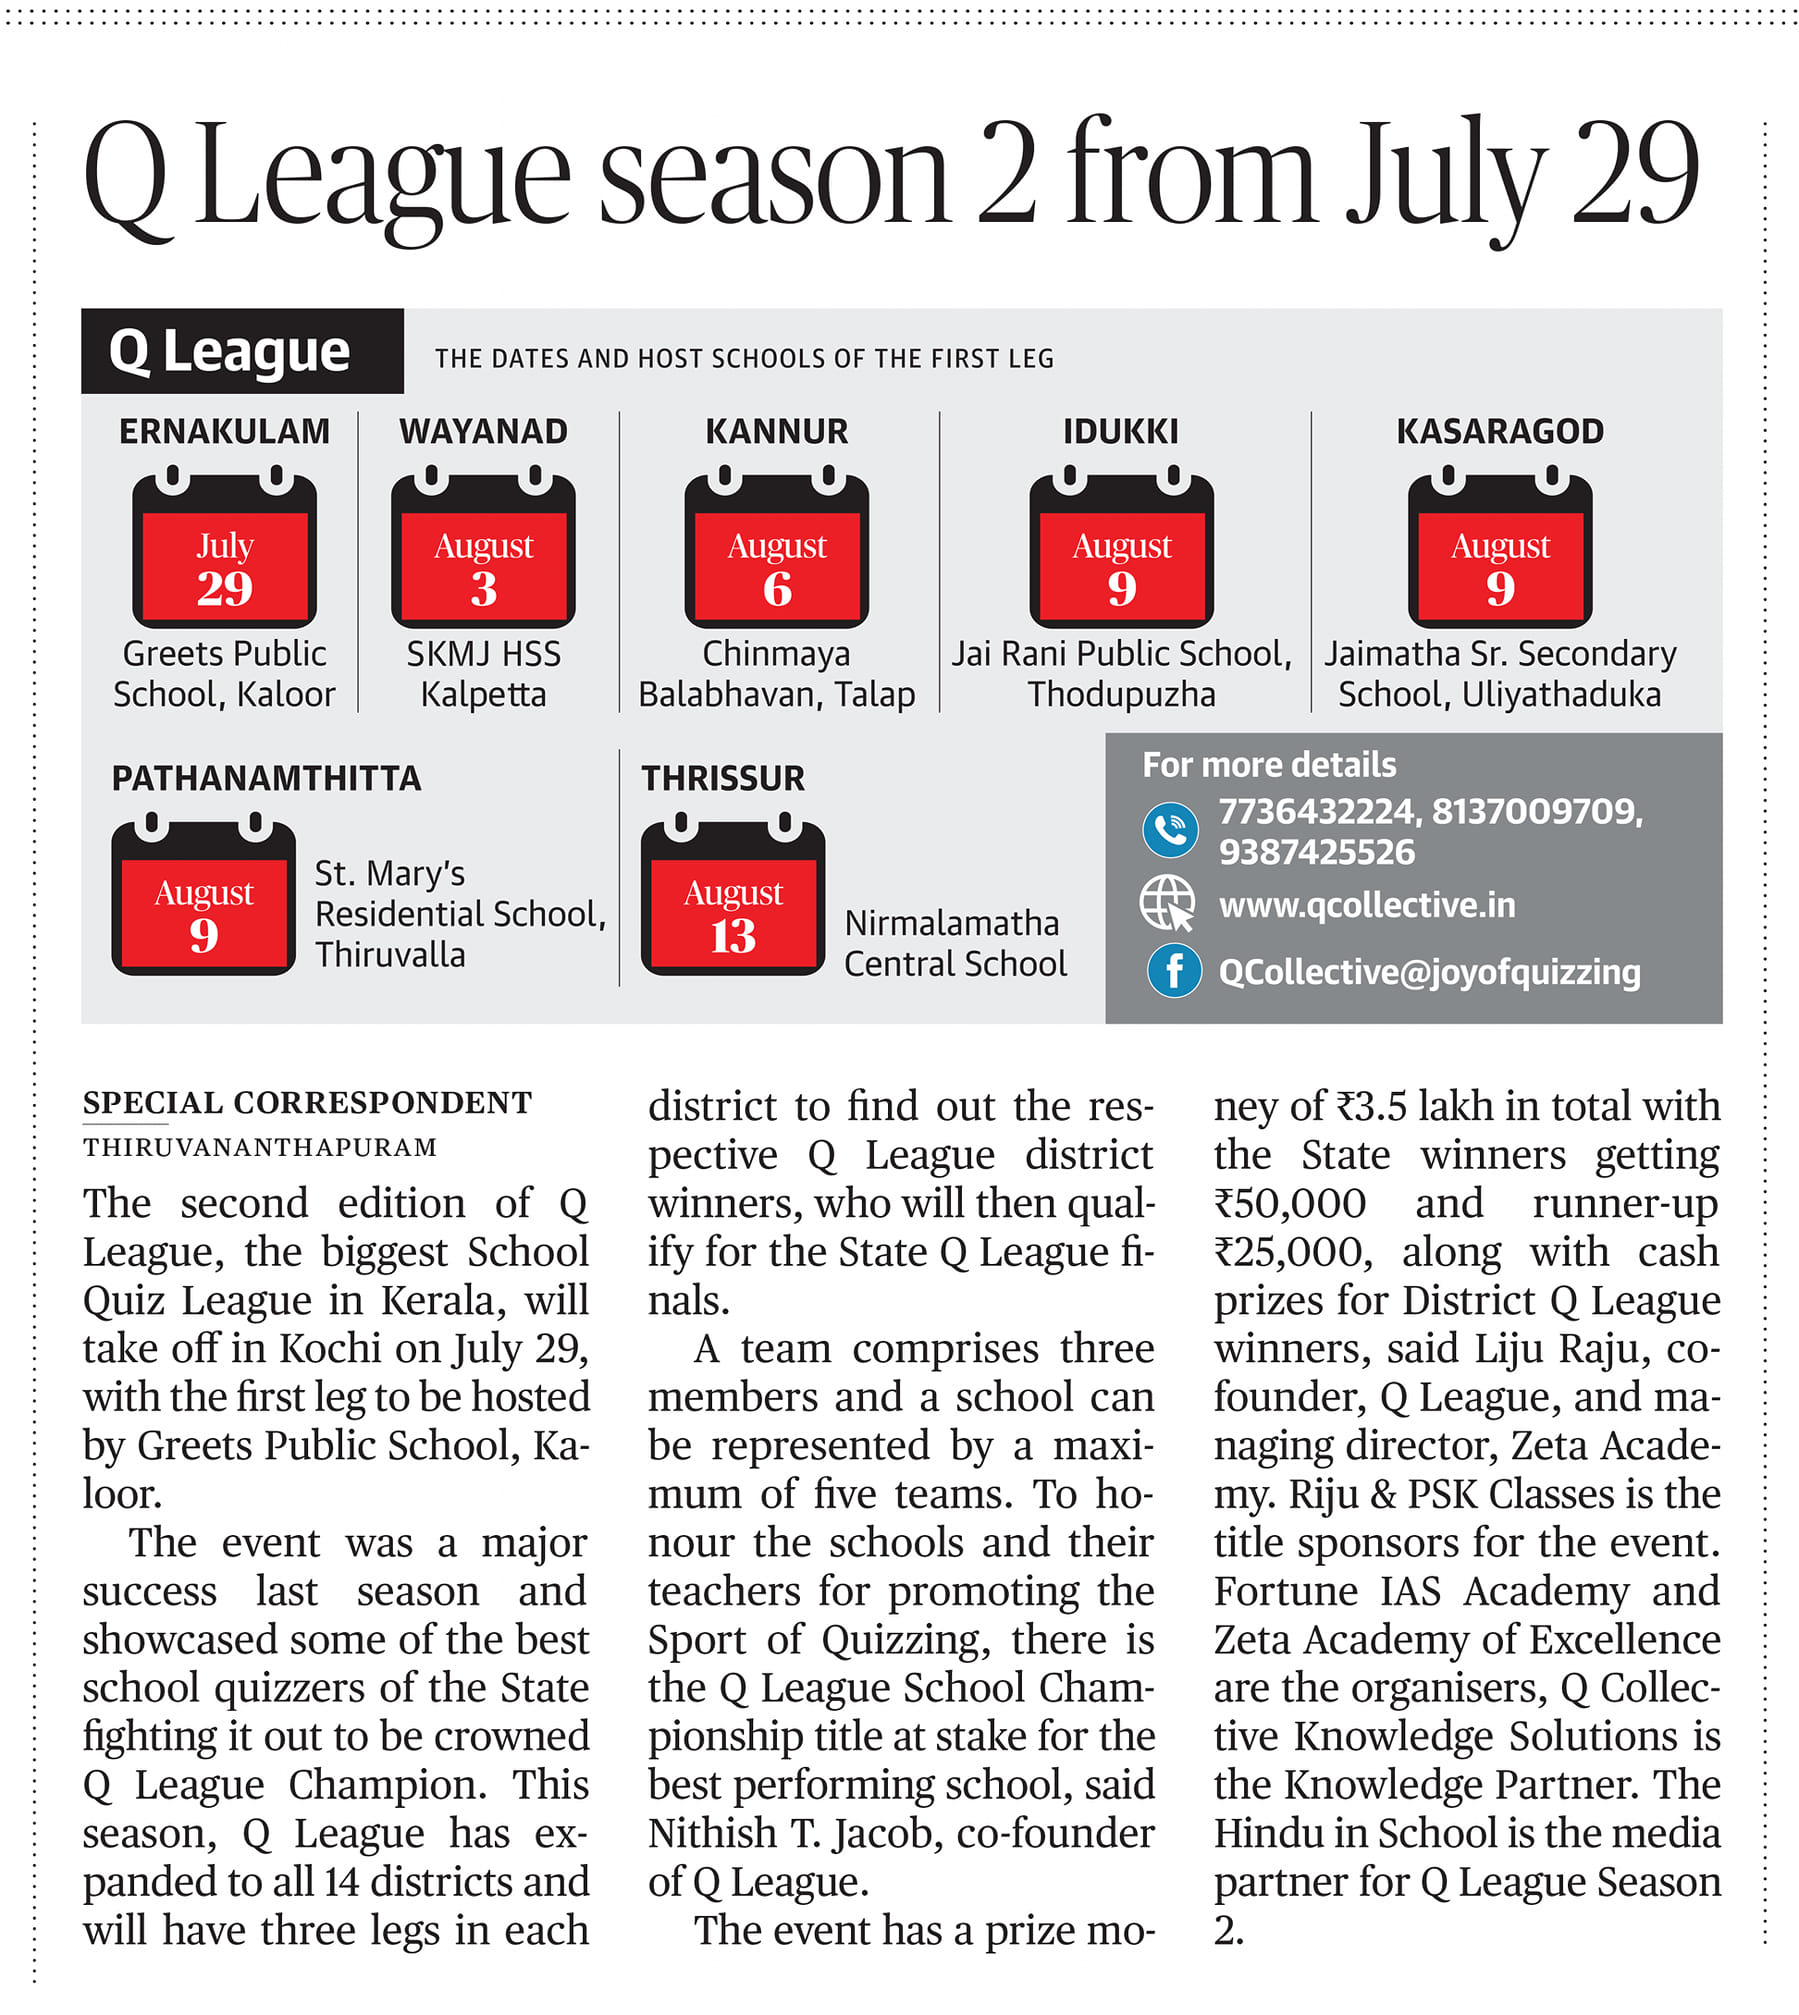 Pre event coverage of Q League season 2, The Hindu